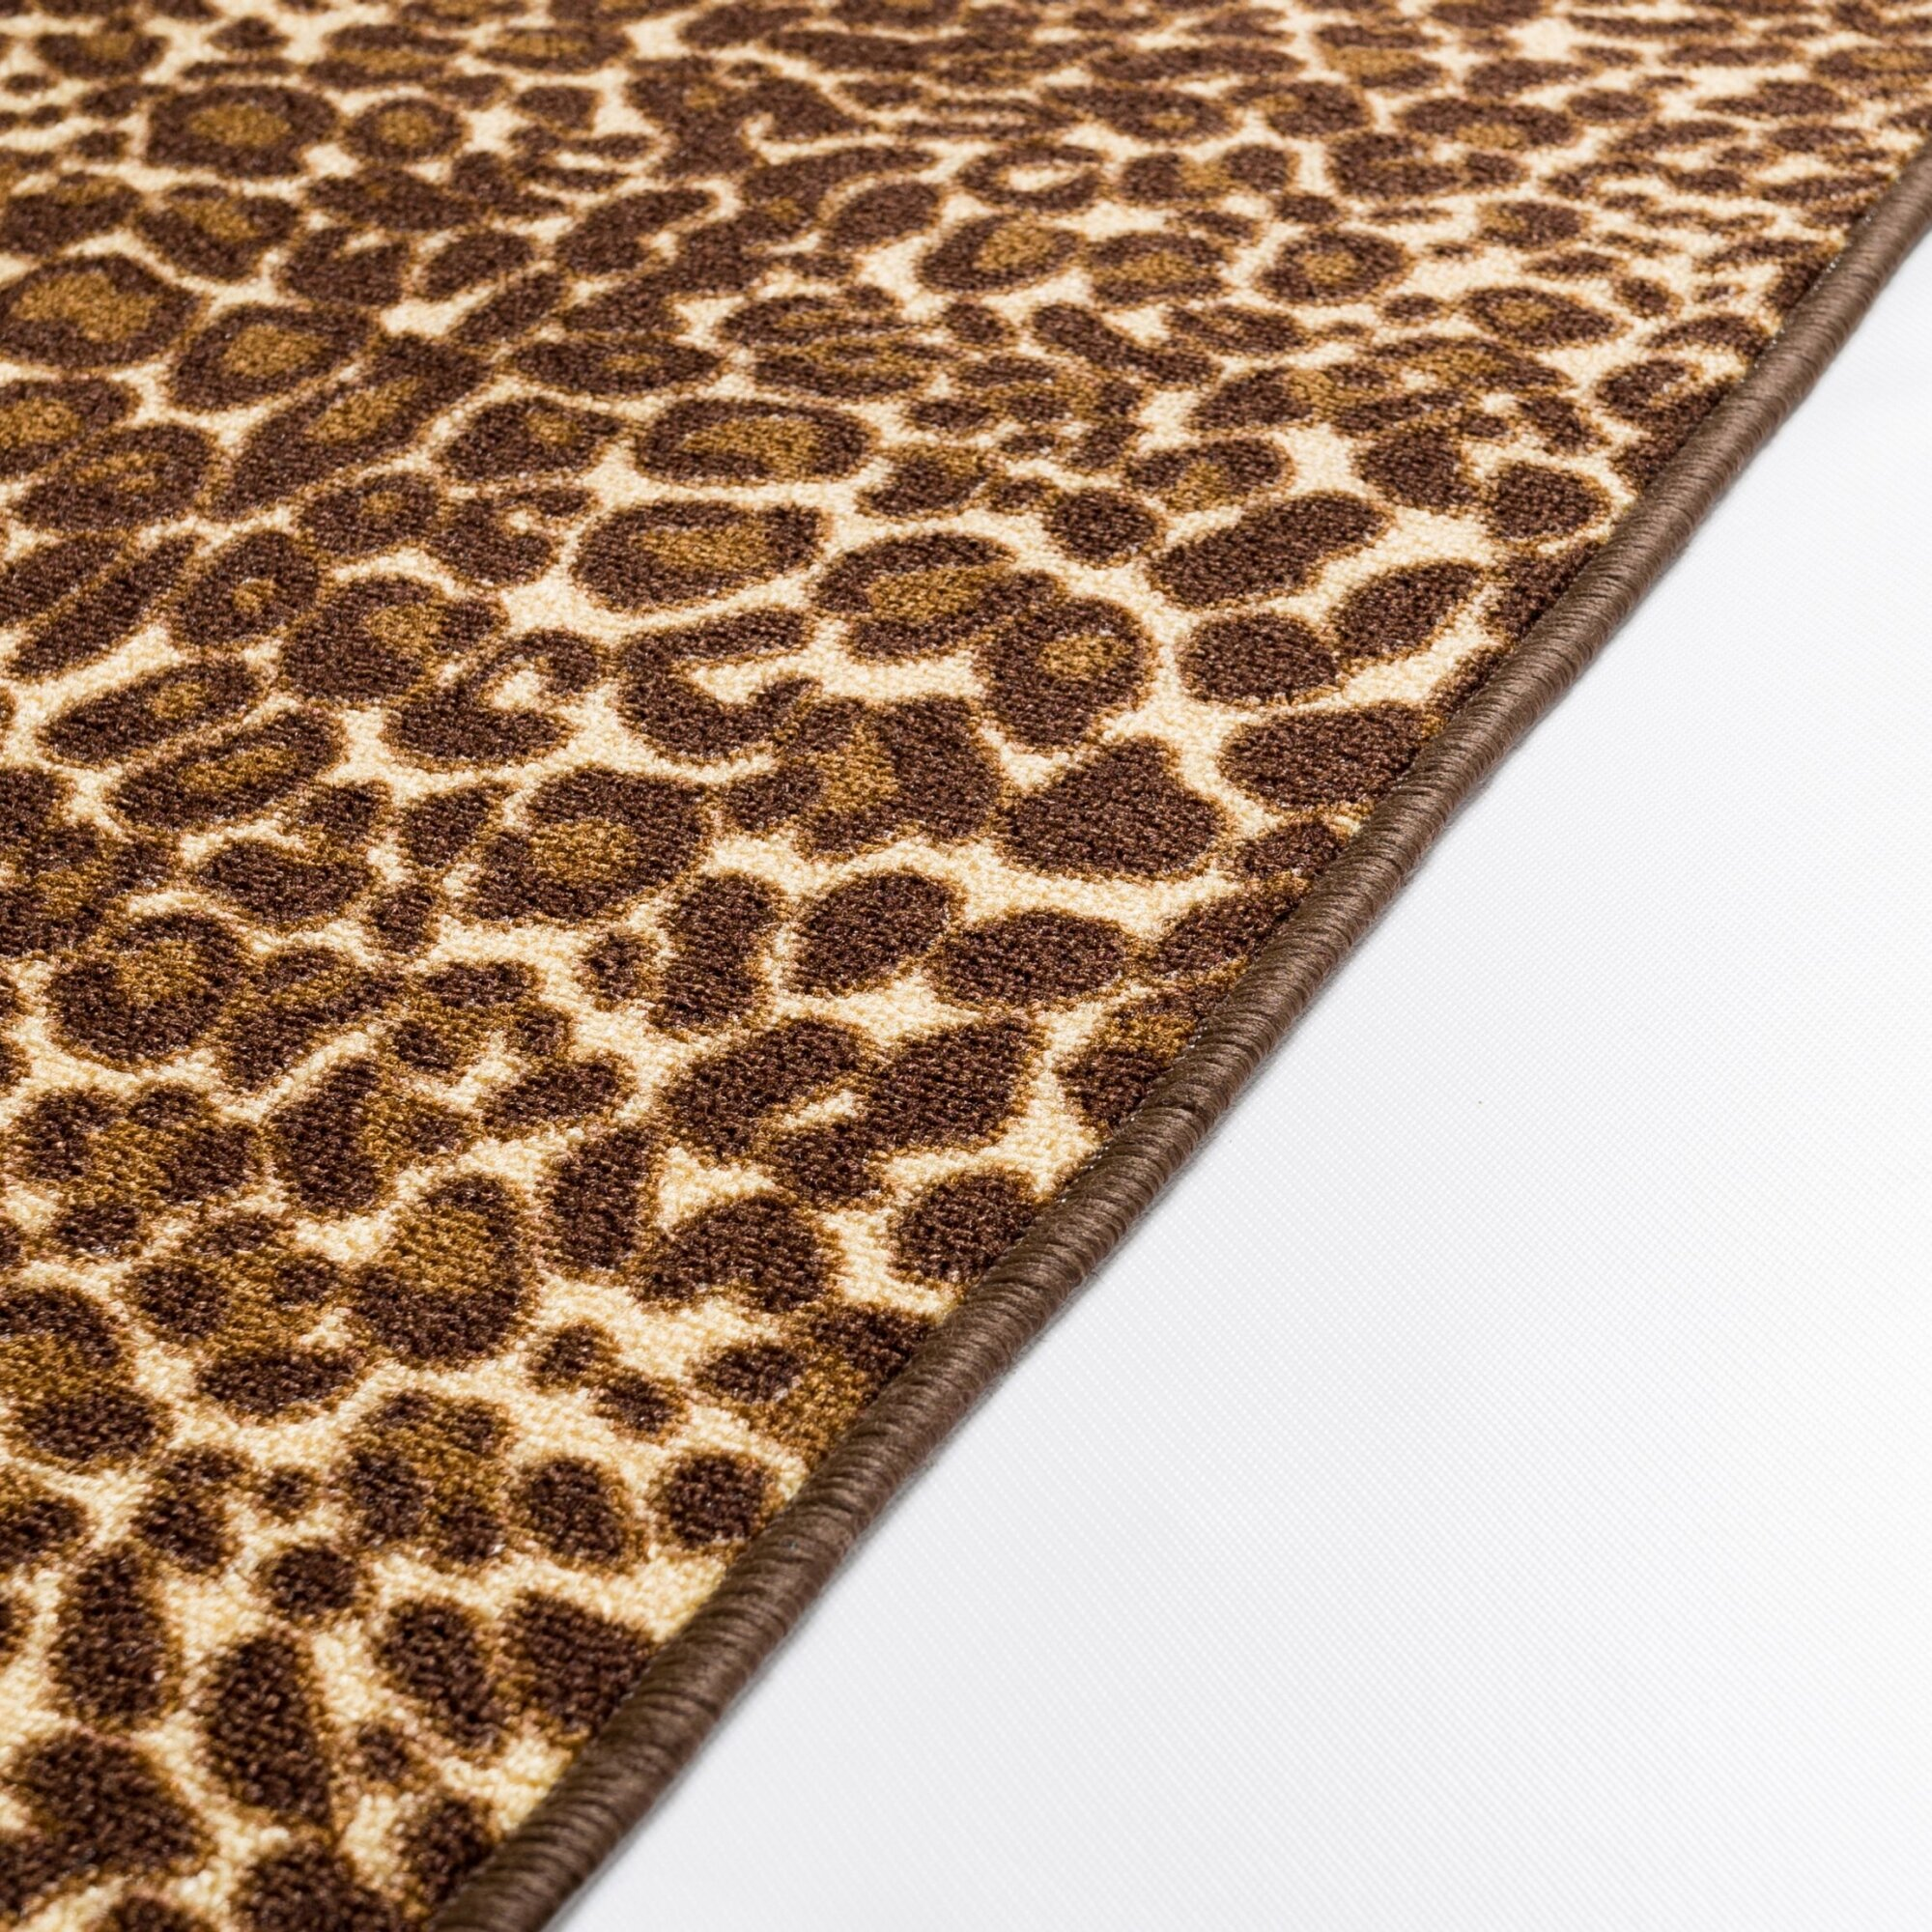 Animal Print Rug Wayfair: Well Woven Kings Court Gold Leopard Print Area Rug